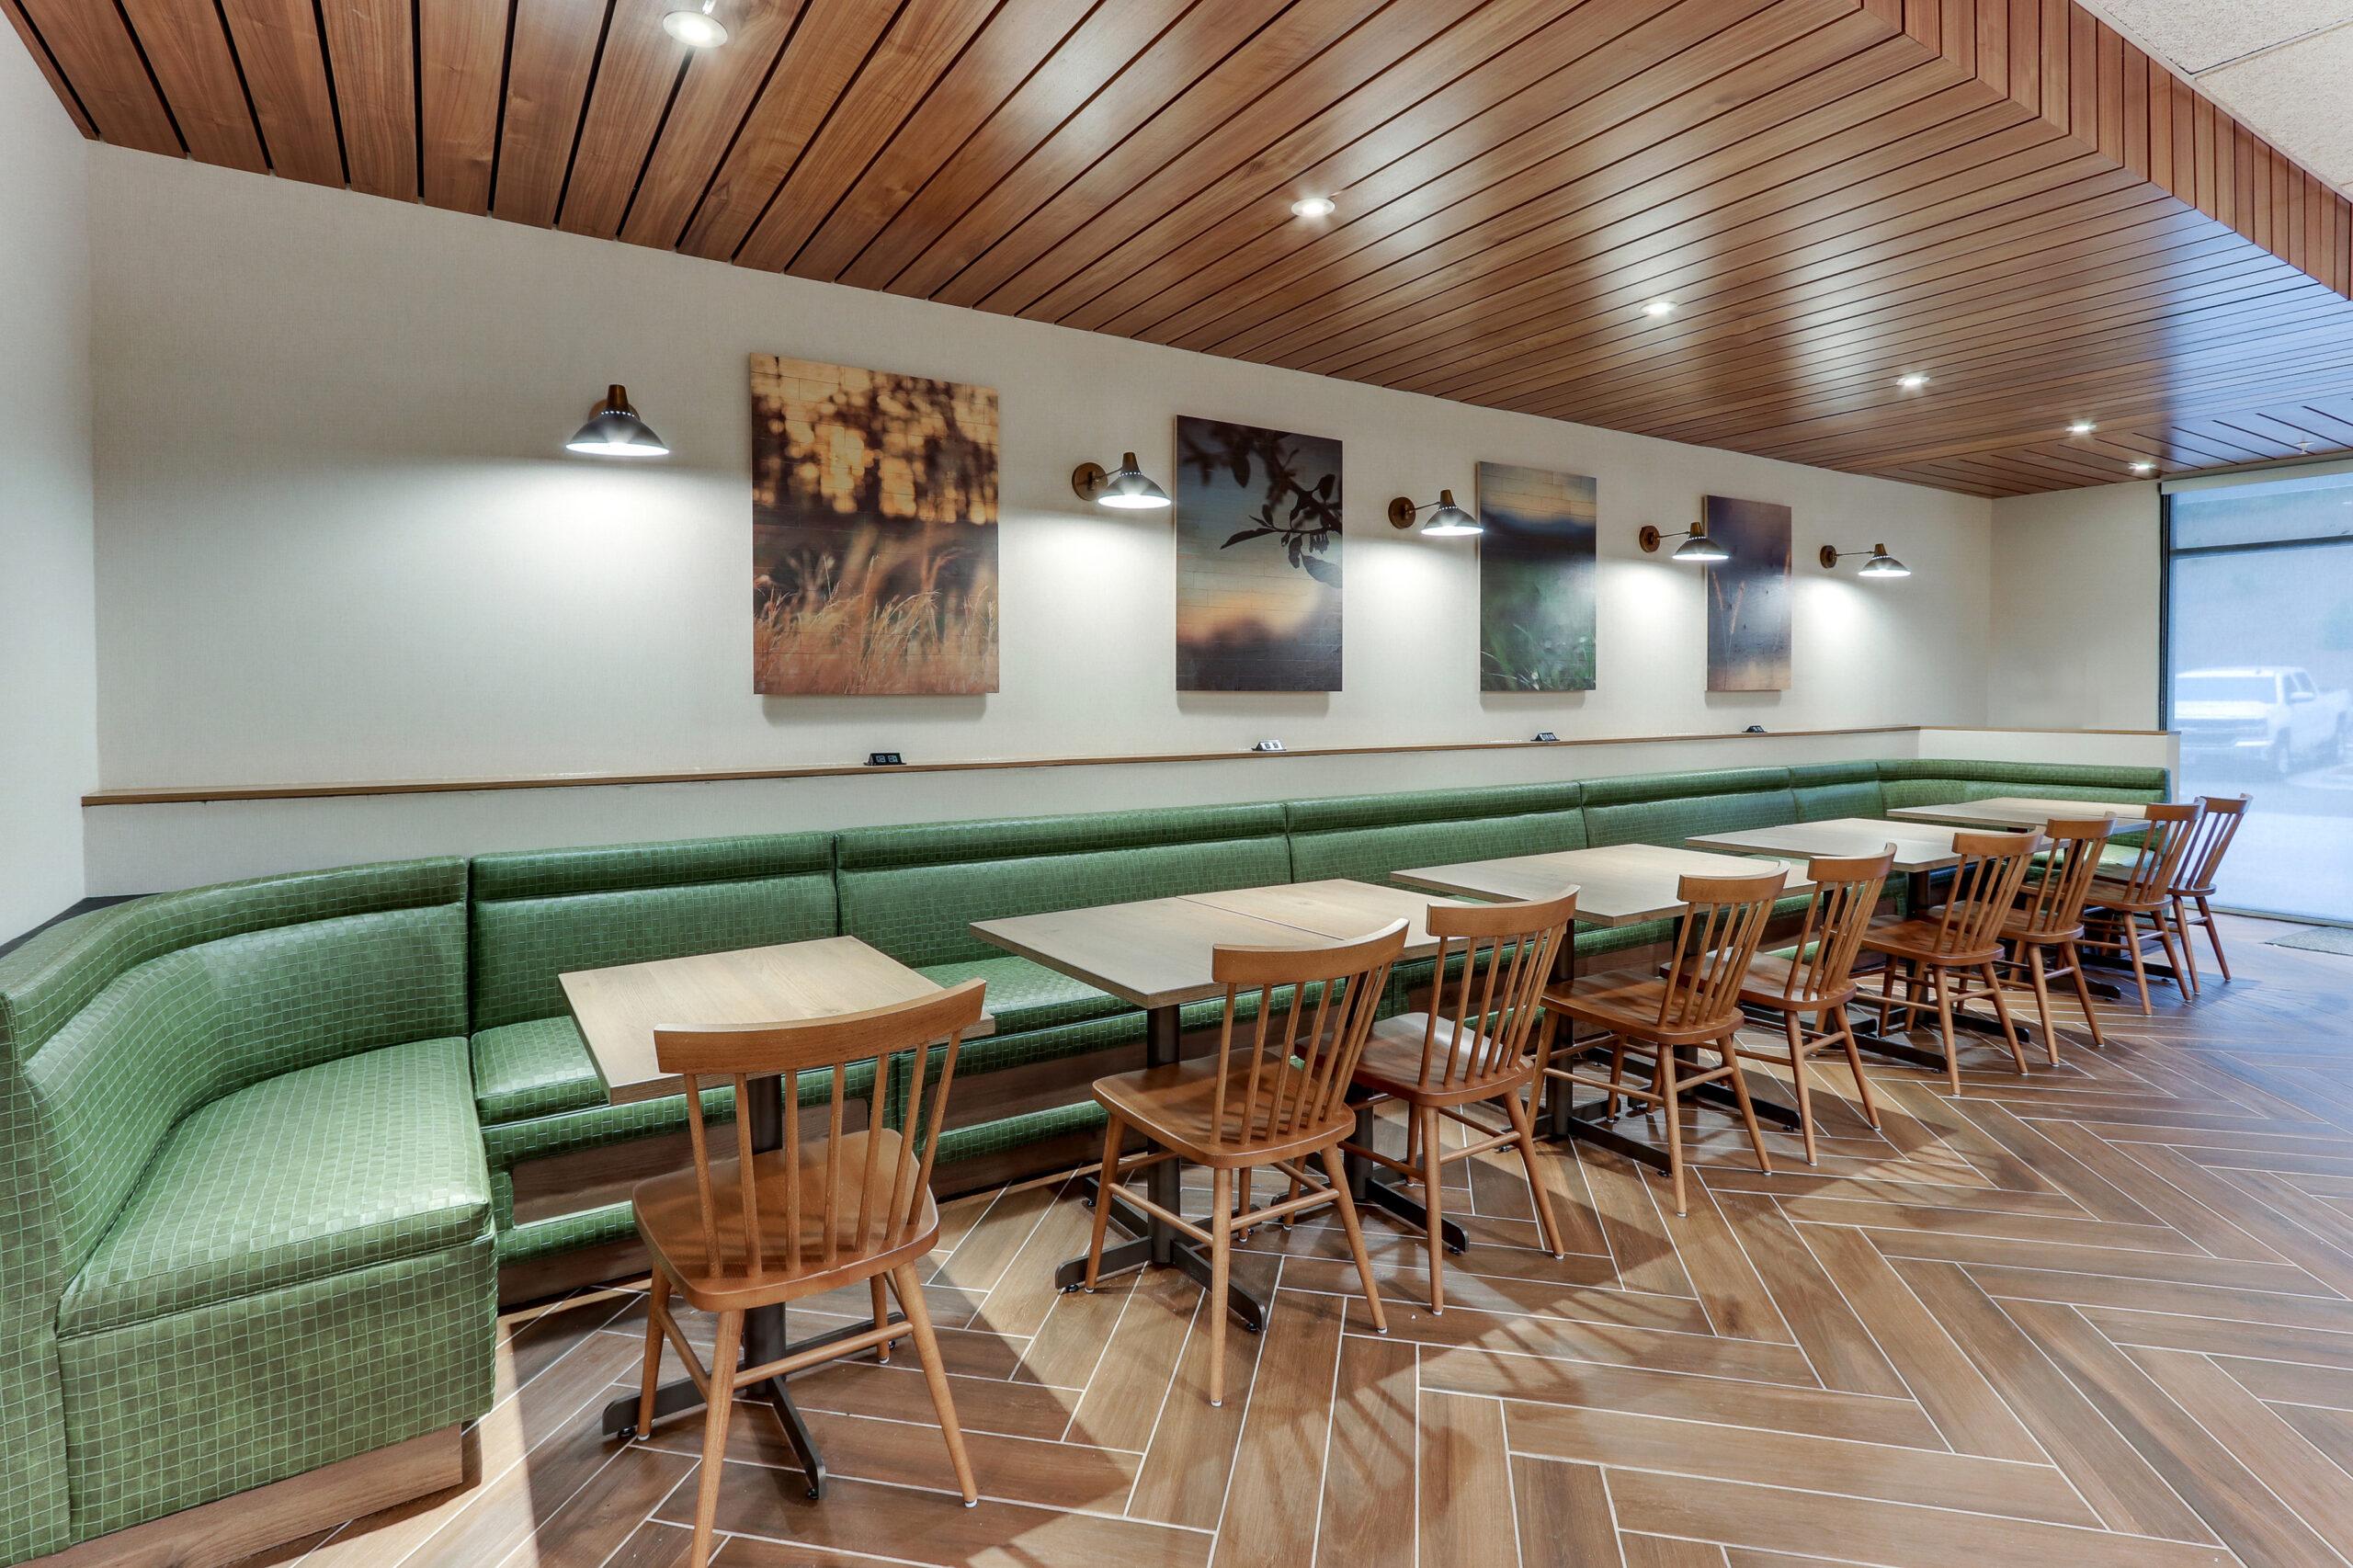 FF_AVLFW_Dining Area 04